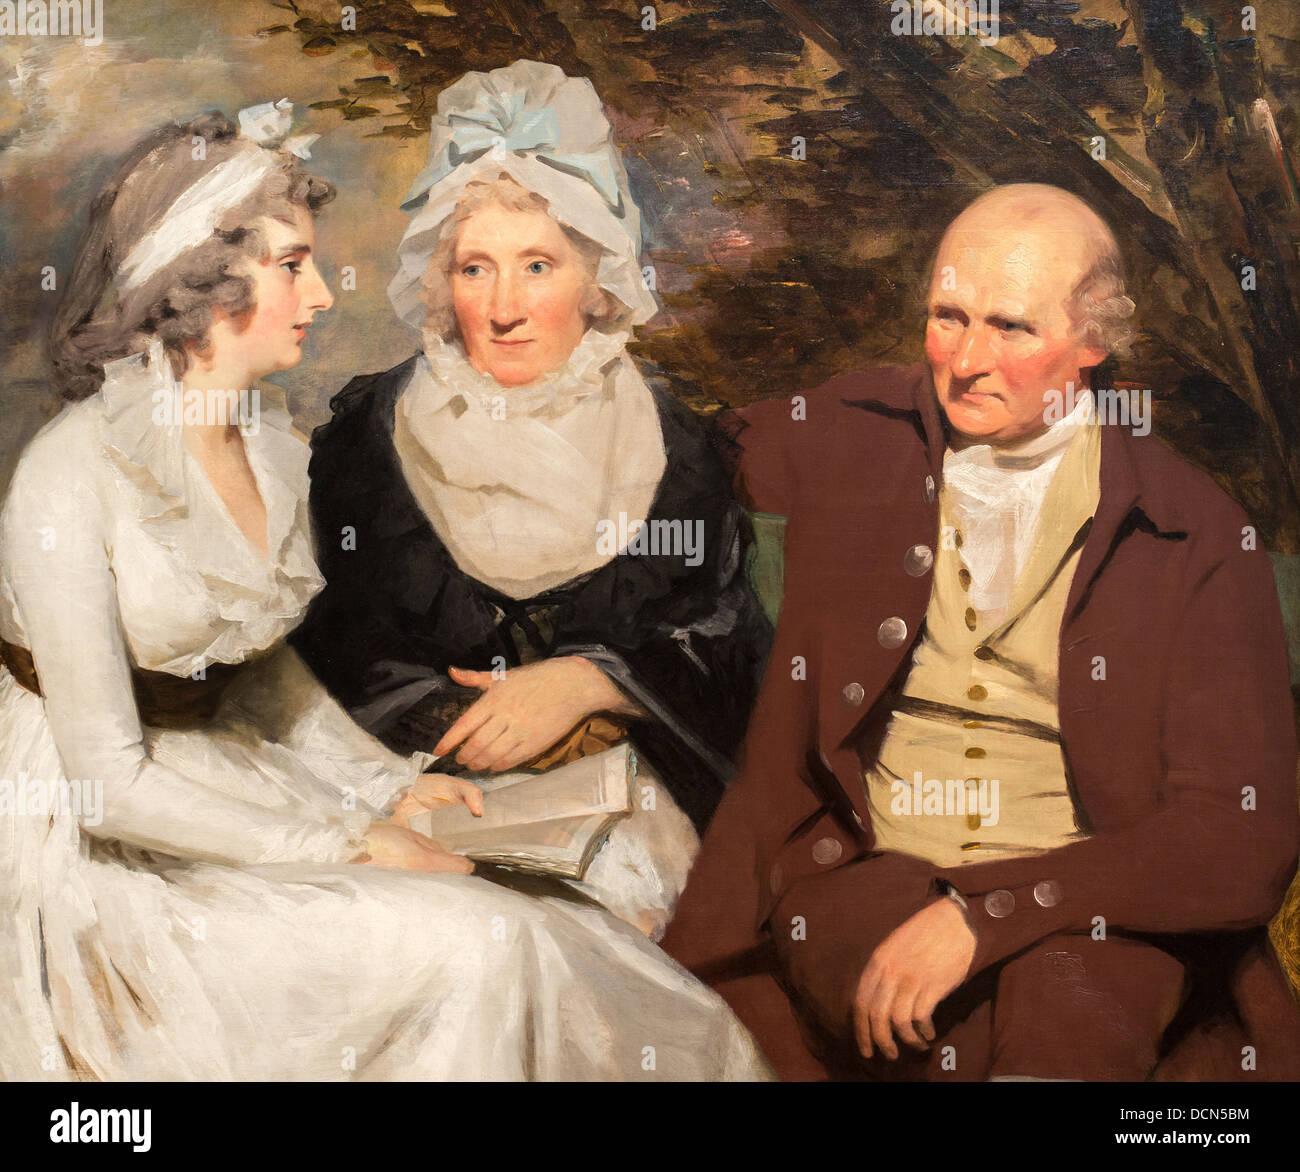 Il XVIII secolo - John Johnstone, Betty Johnstone e Miss Wedderburn - Sir Henry Raeburn (1790) Immagini Stock